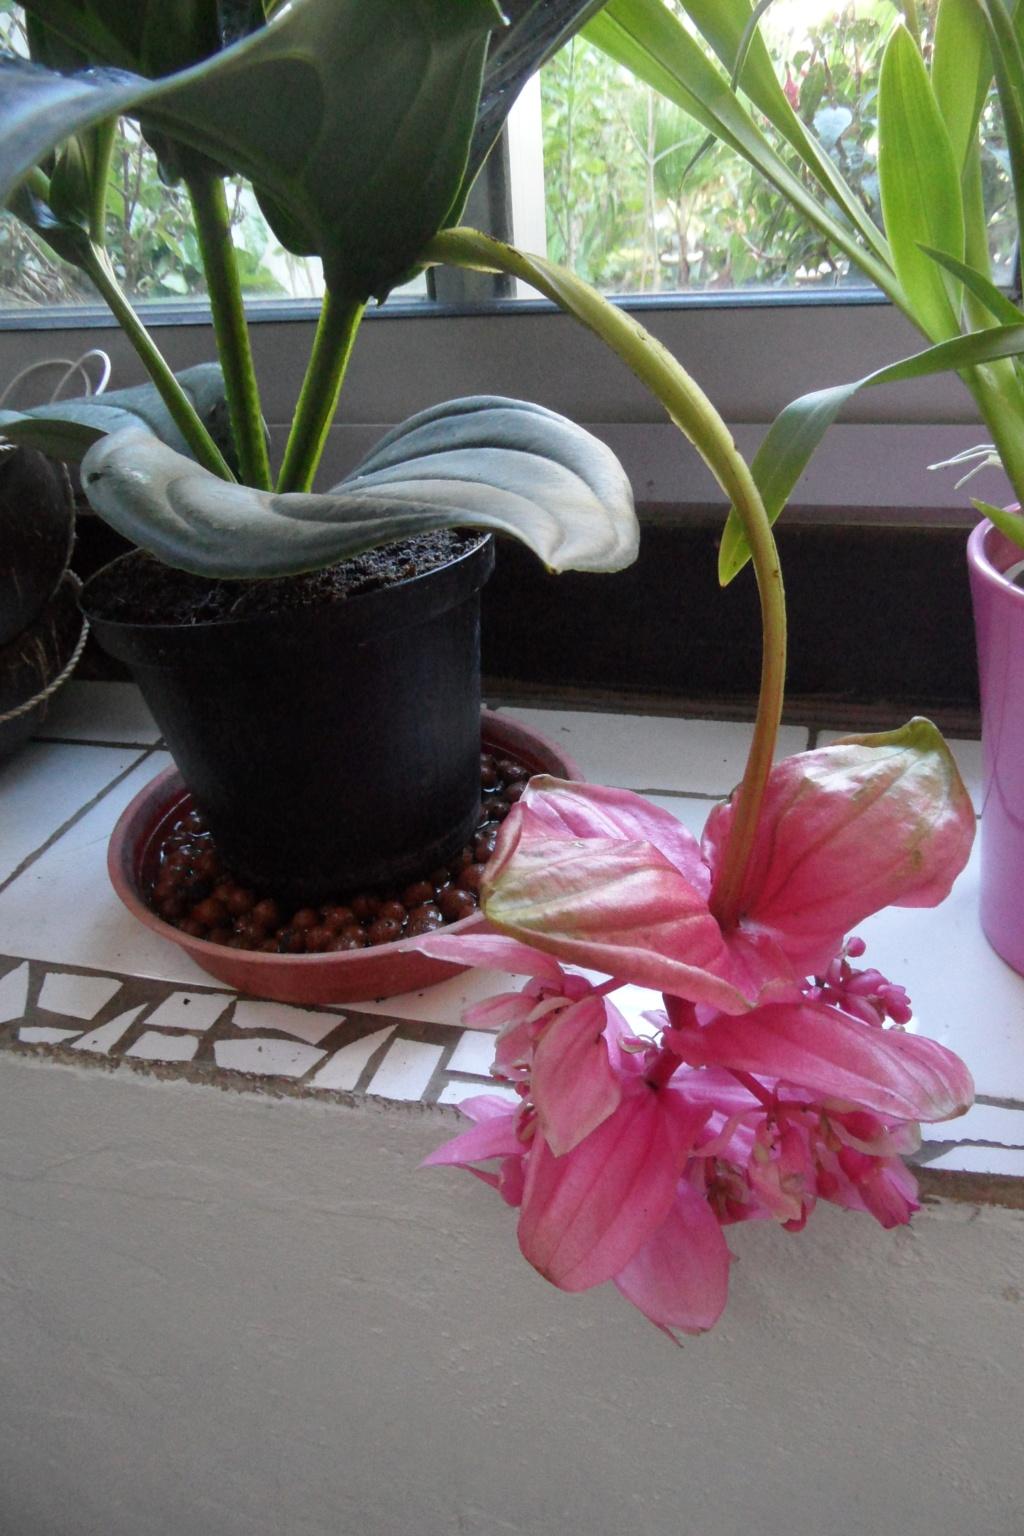 Mes plantes dans la véranda - Page 2 Sam_0546